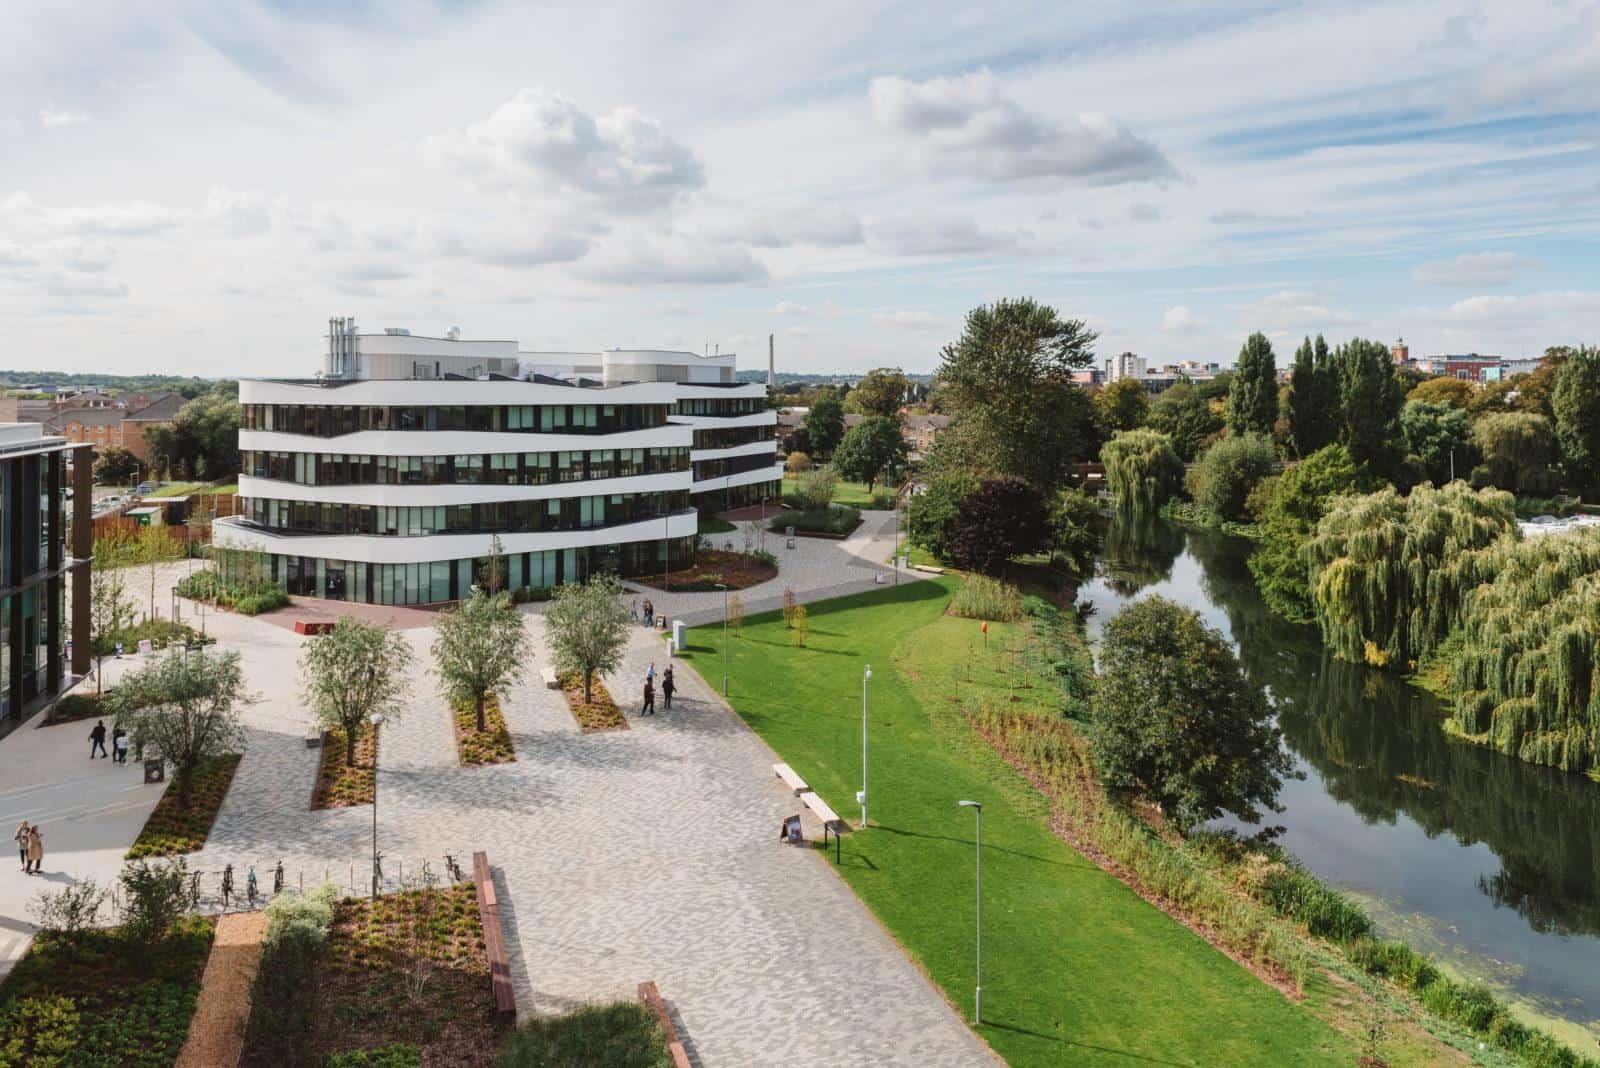 Digital innovation Northampton - Merged Futures Waterside Campus